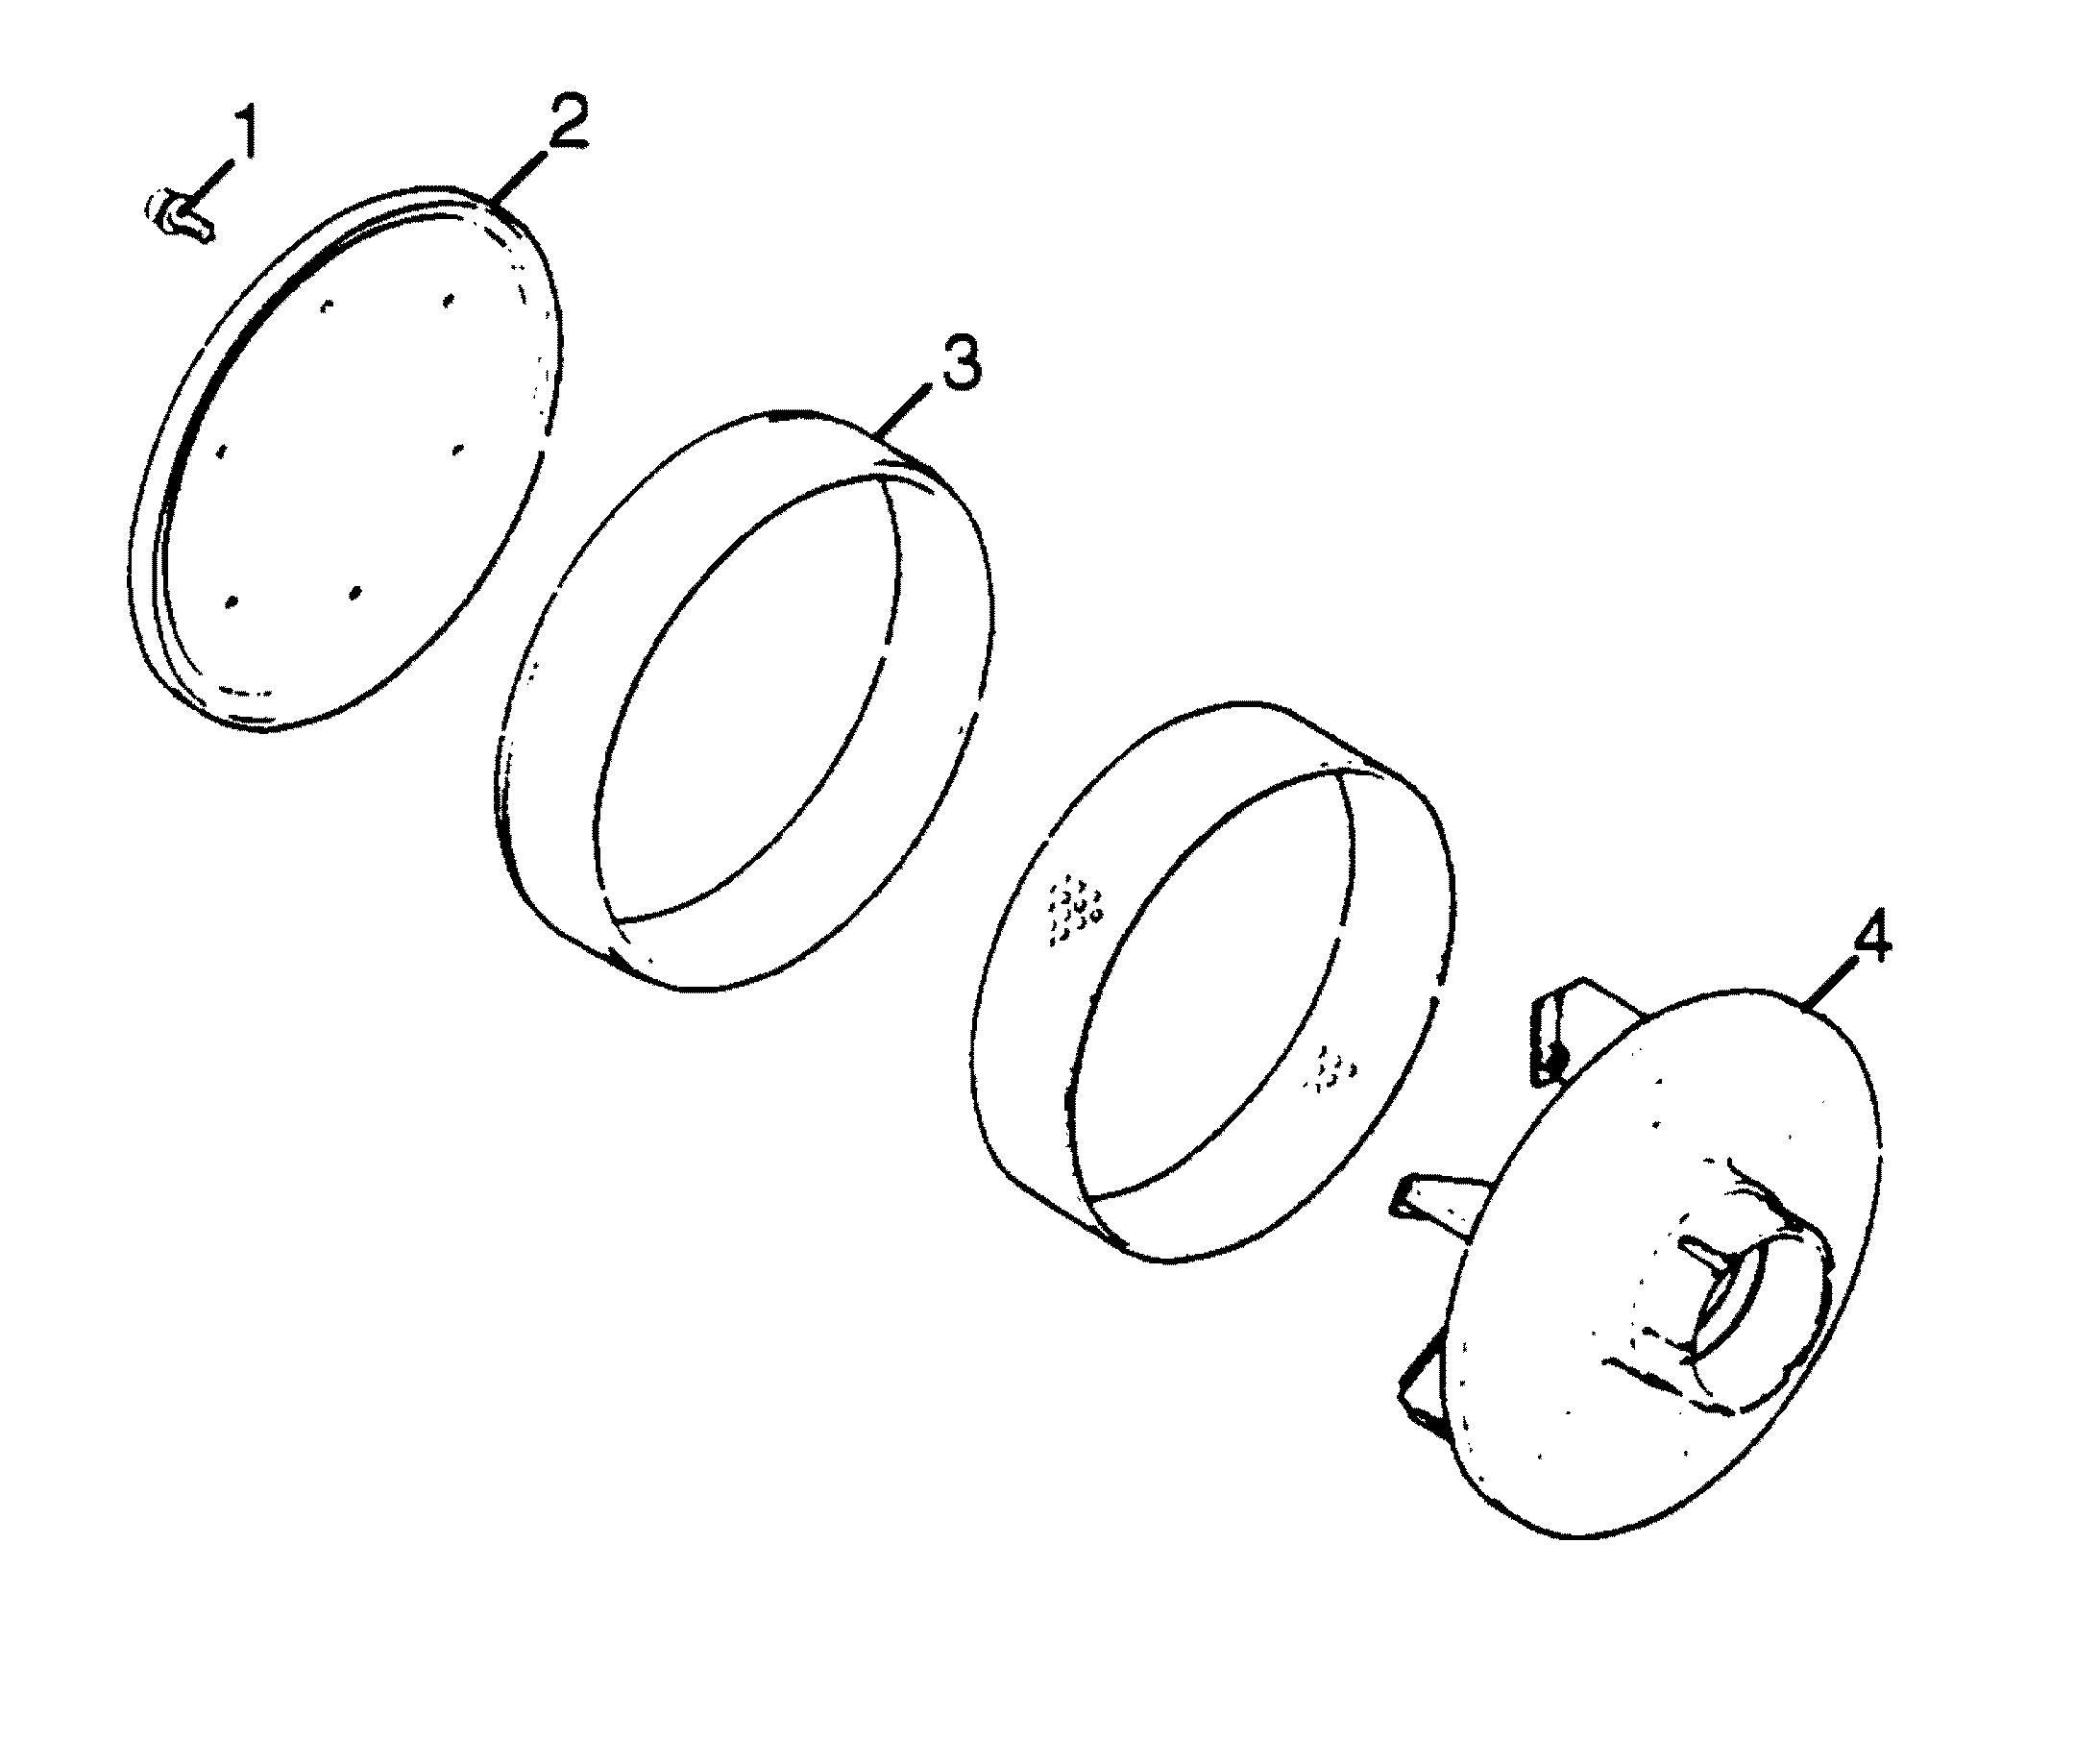 Mercruiser W06dta 310 Hp